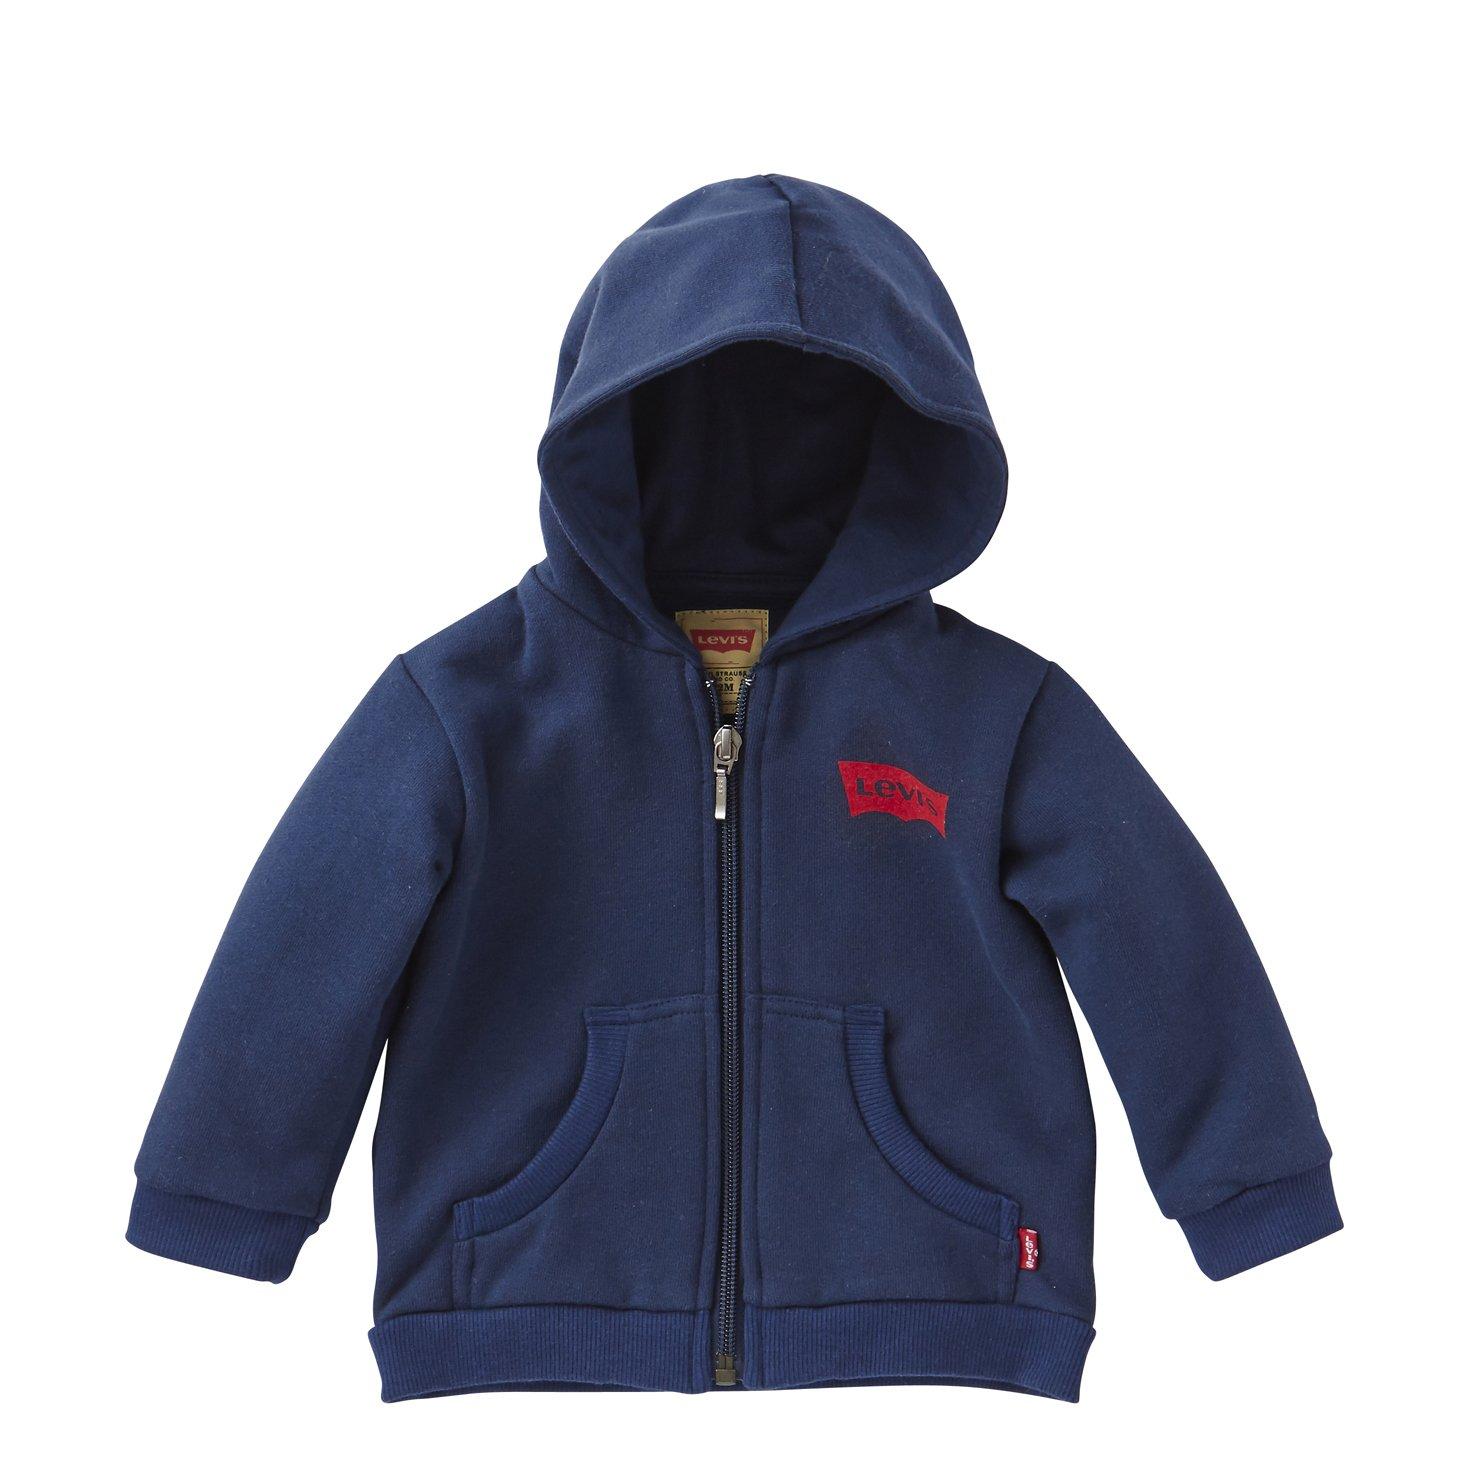 Levi's Baby Boys Zipper NOS Sports Hoodie Levis Groupe Zannier International N91700H